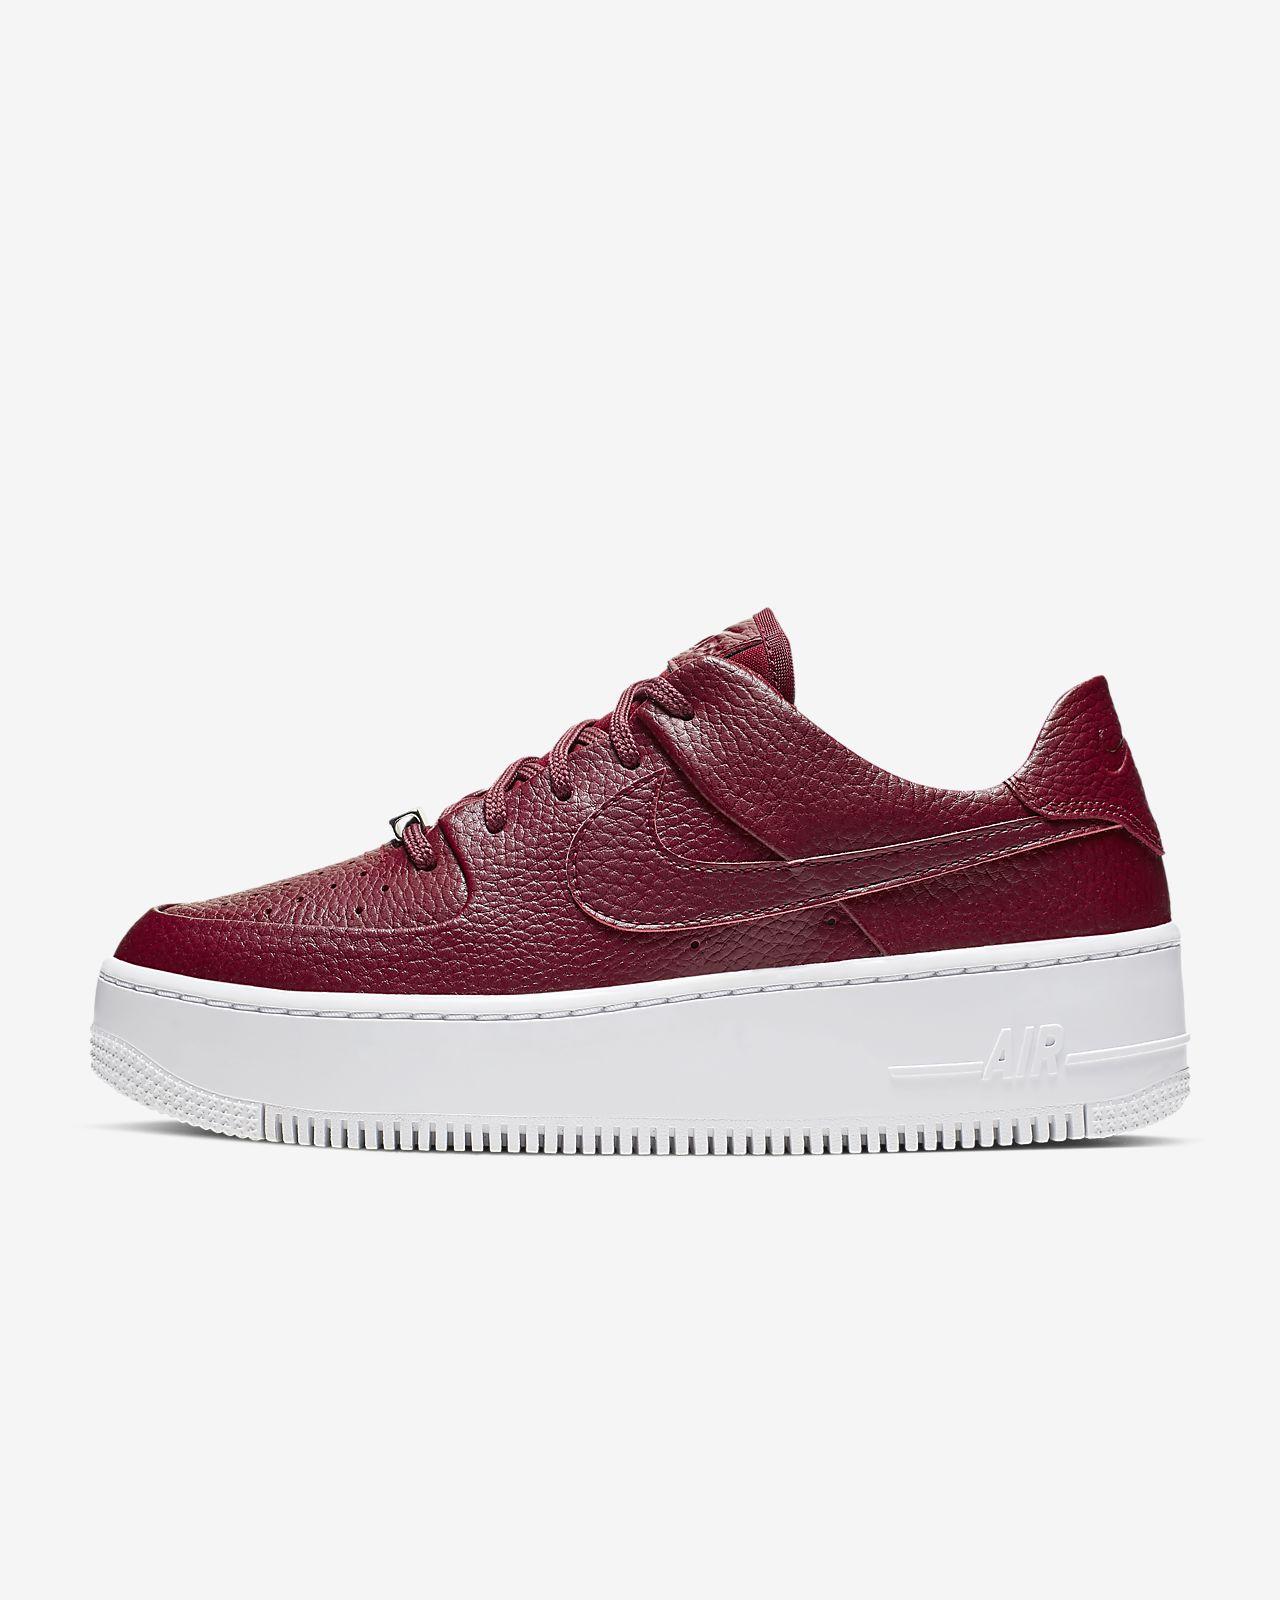 Nike Herre Sko Høye sneakers Oslo Salg Gratis Frakt, Sjekk